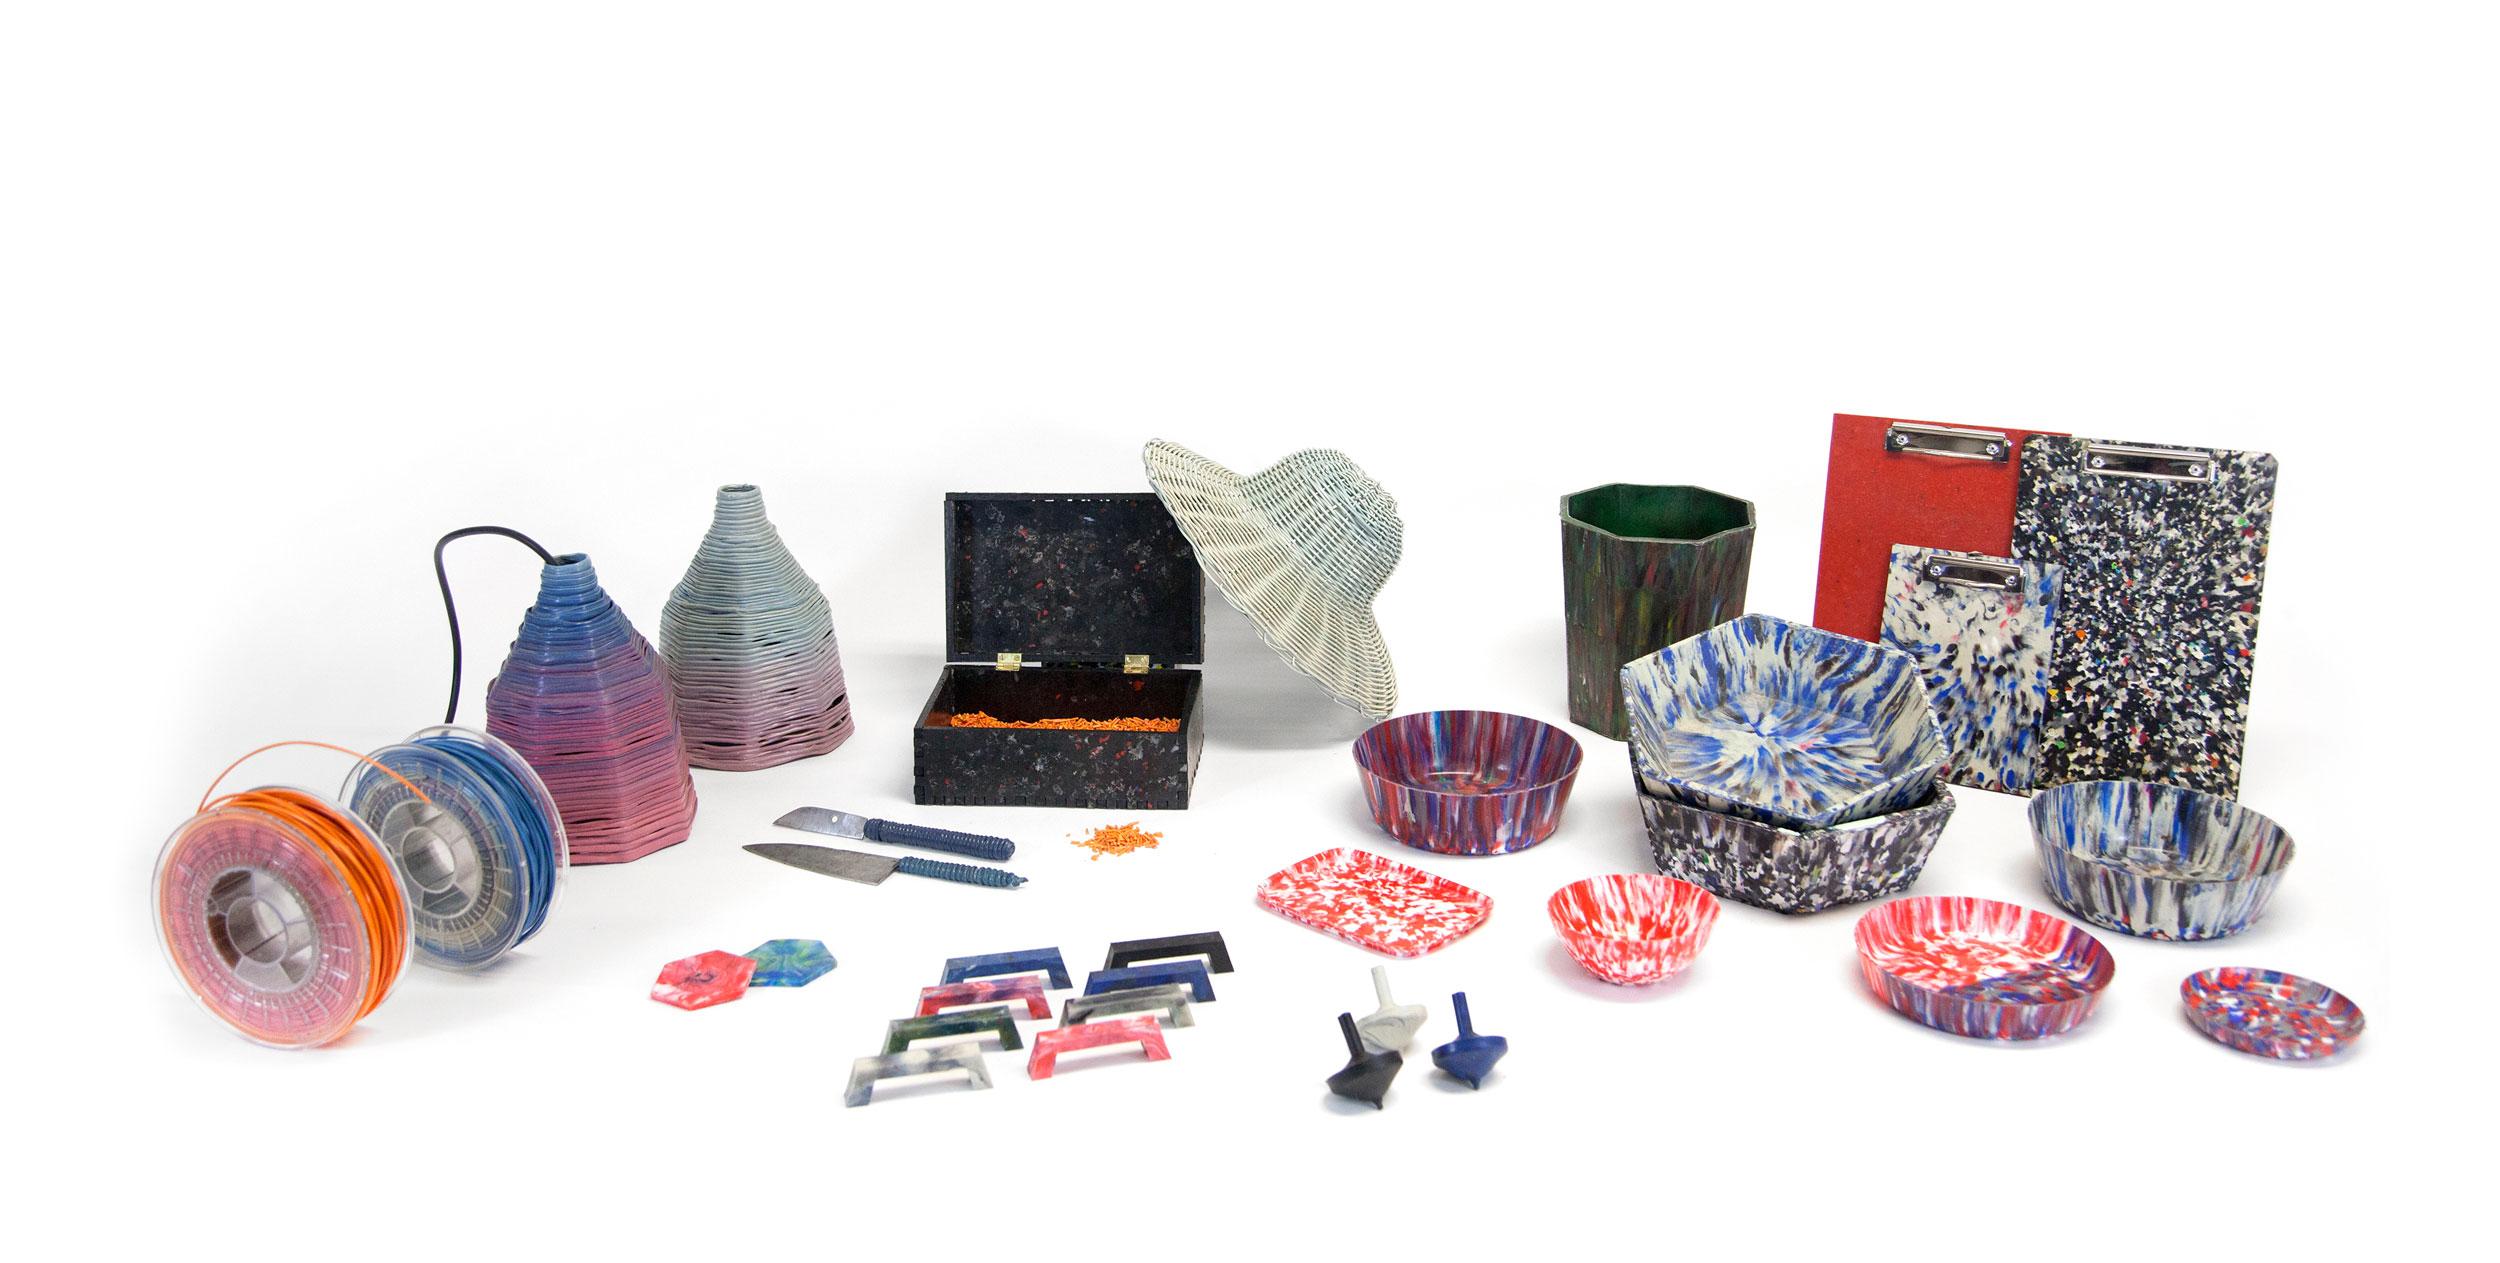 Plástico reutilizado - Foto: preciousplastic.com